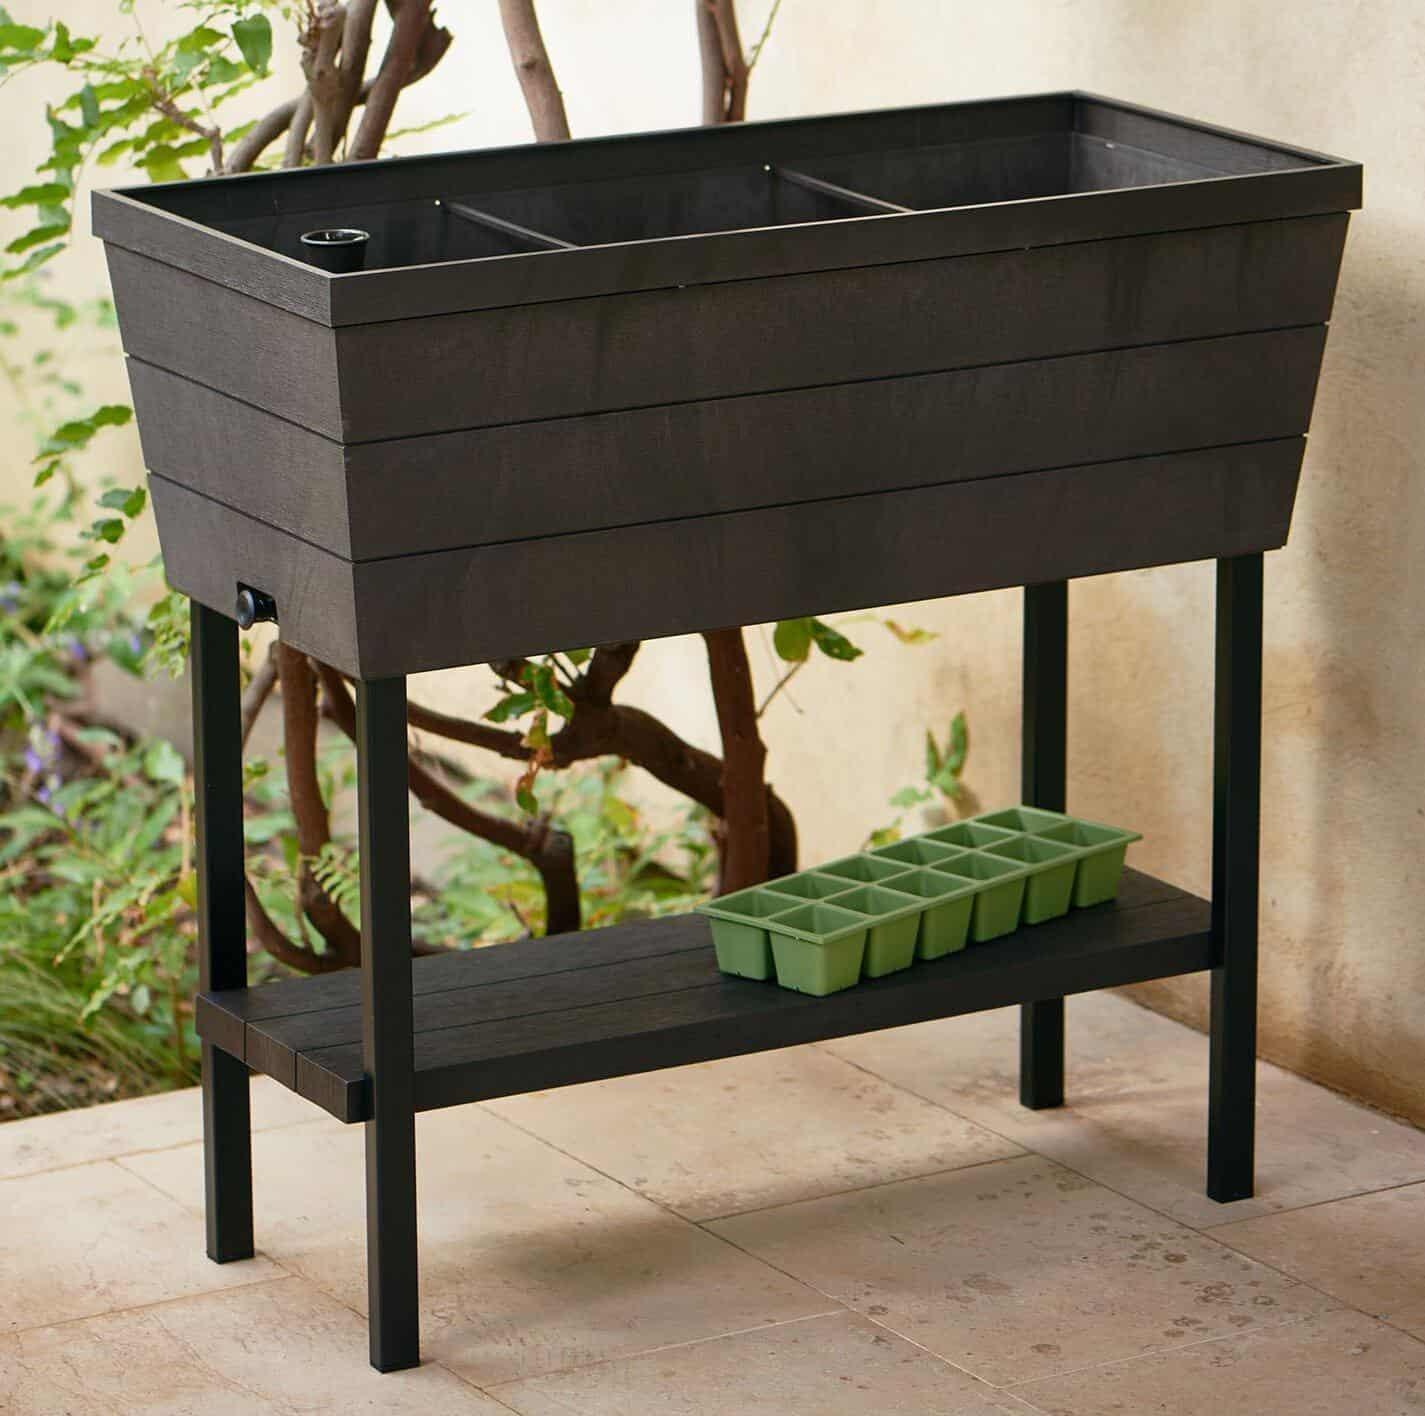 Keter watering planter box